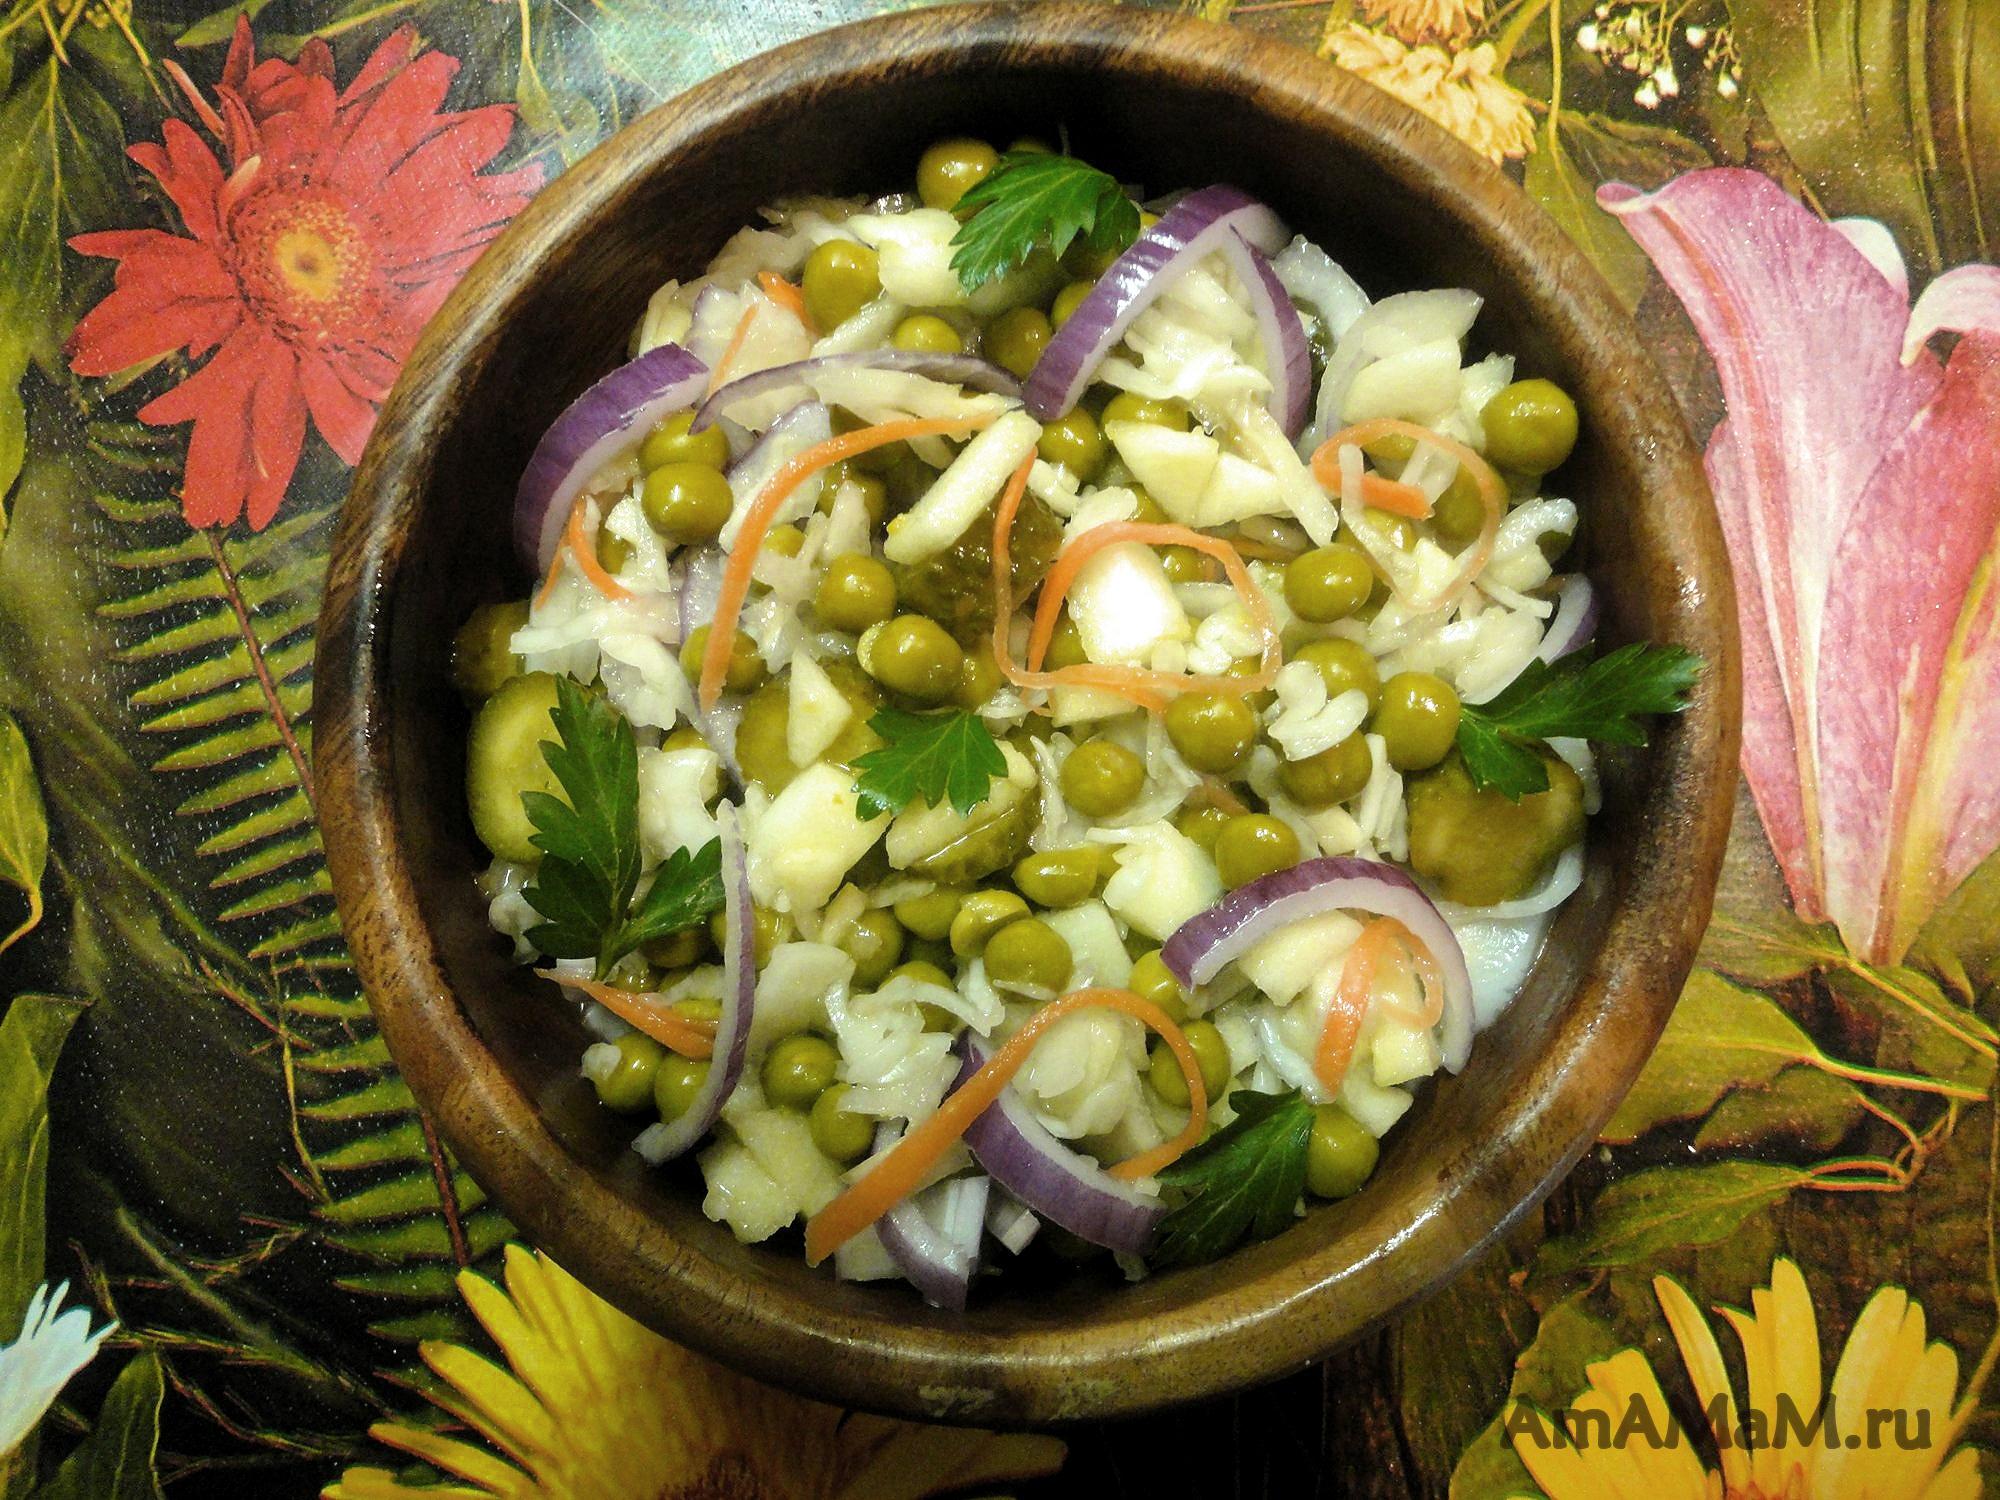 Яблоко огурец капуста салат